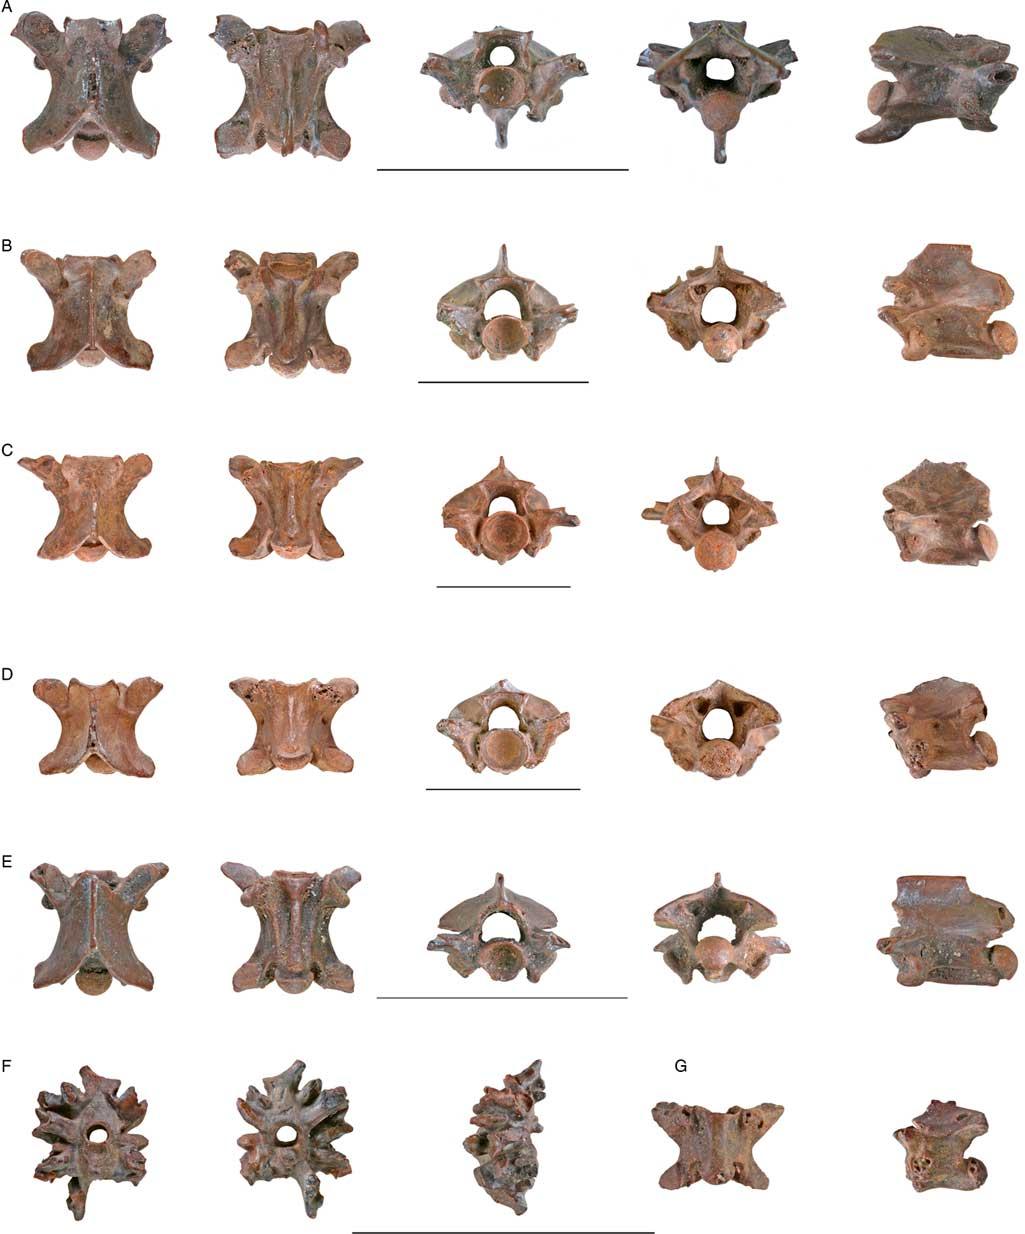 Pleistocene amphibians and squamates from the Upper Jordan